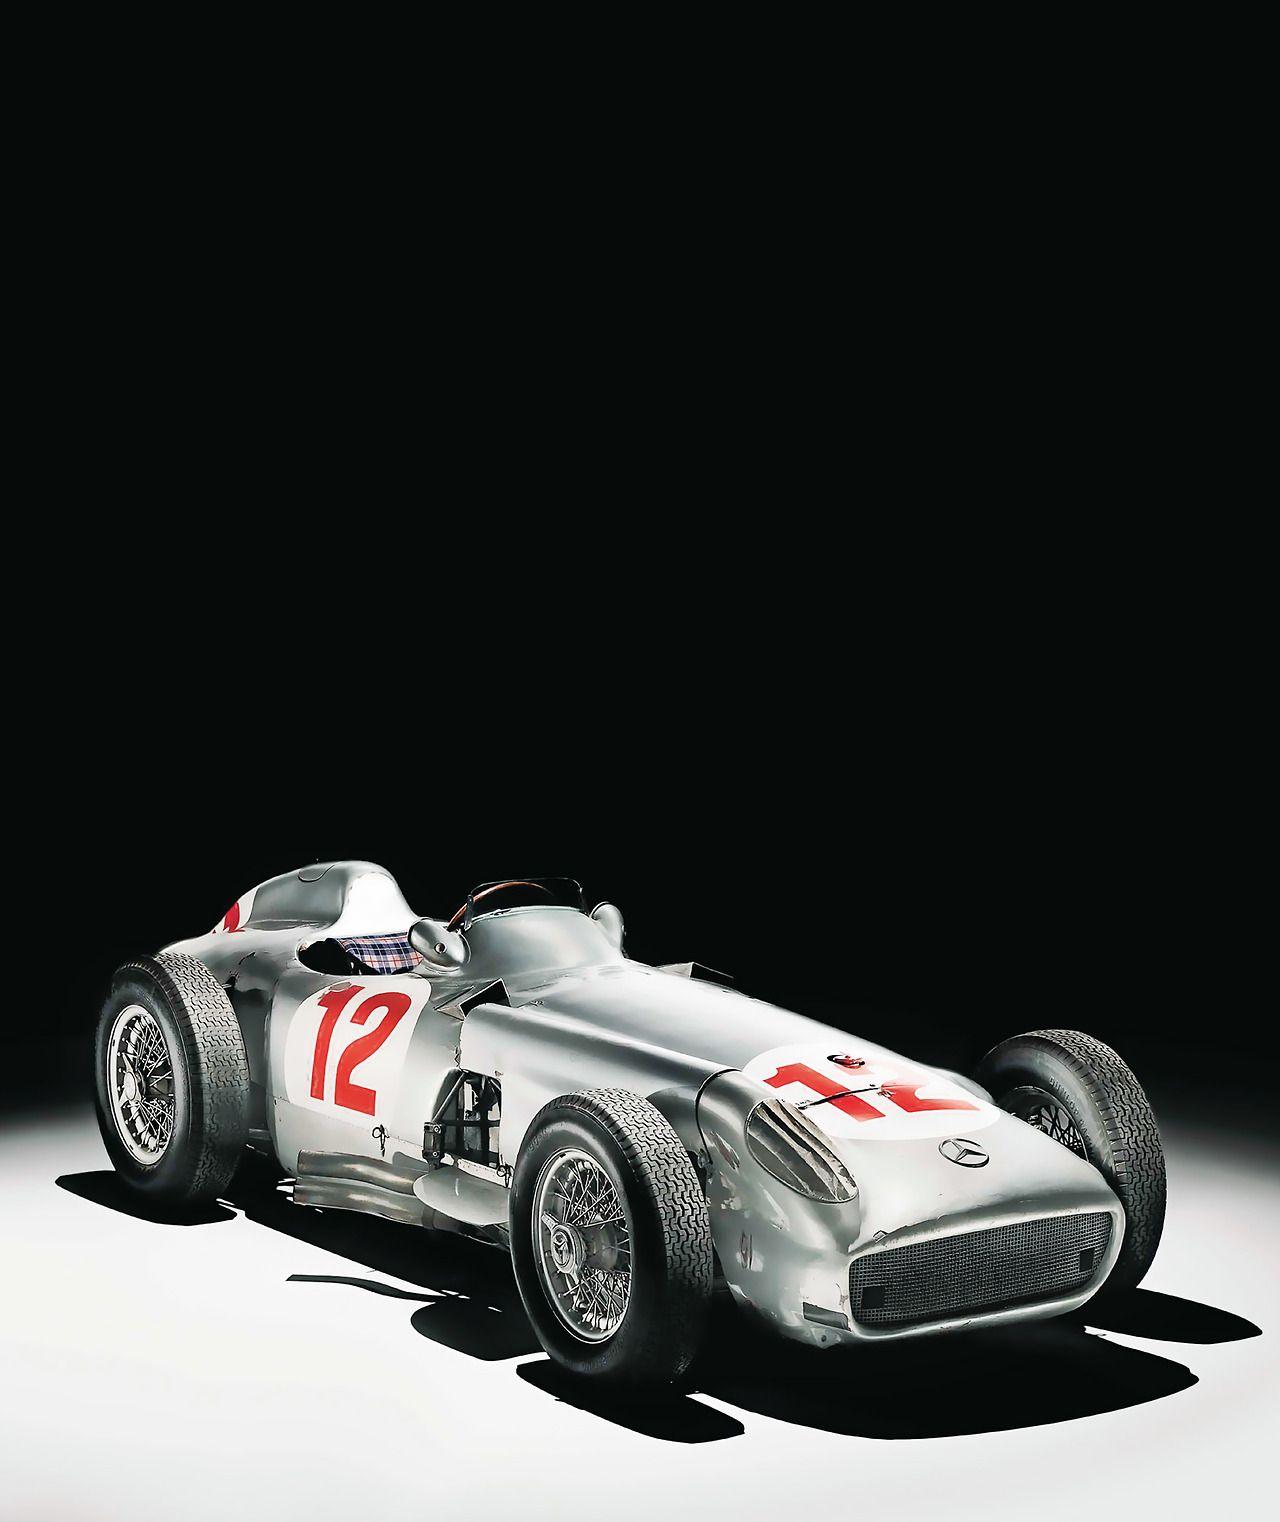 Mercedes Benz W196 race cars Pinterest